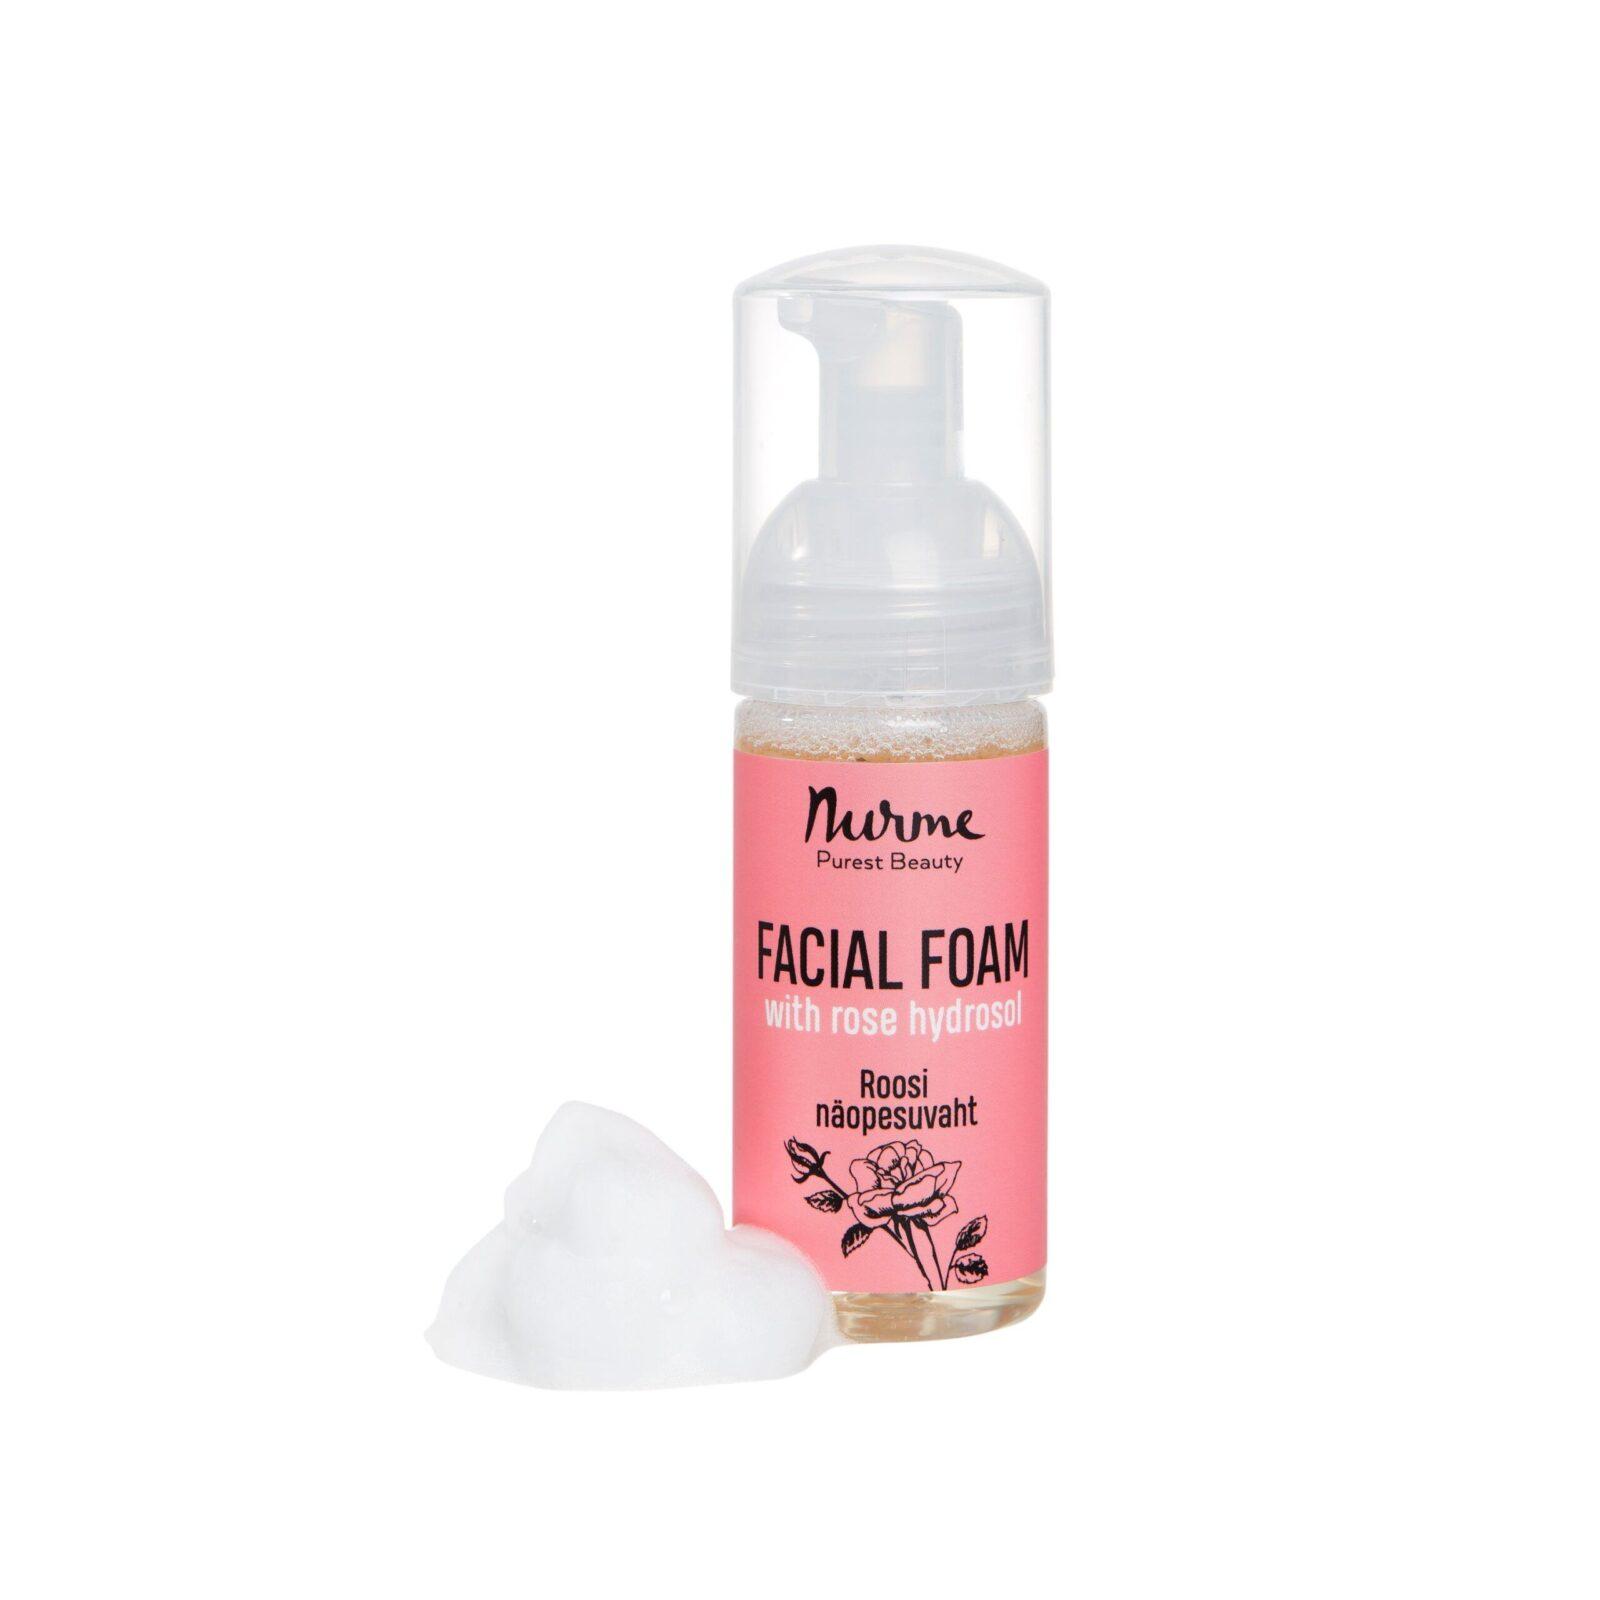 Facial foam with rose